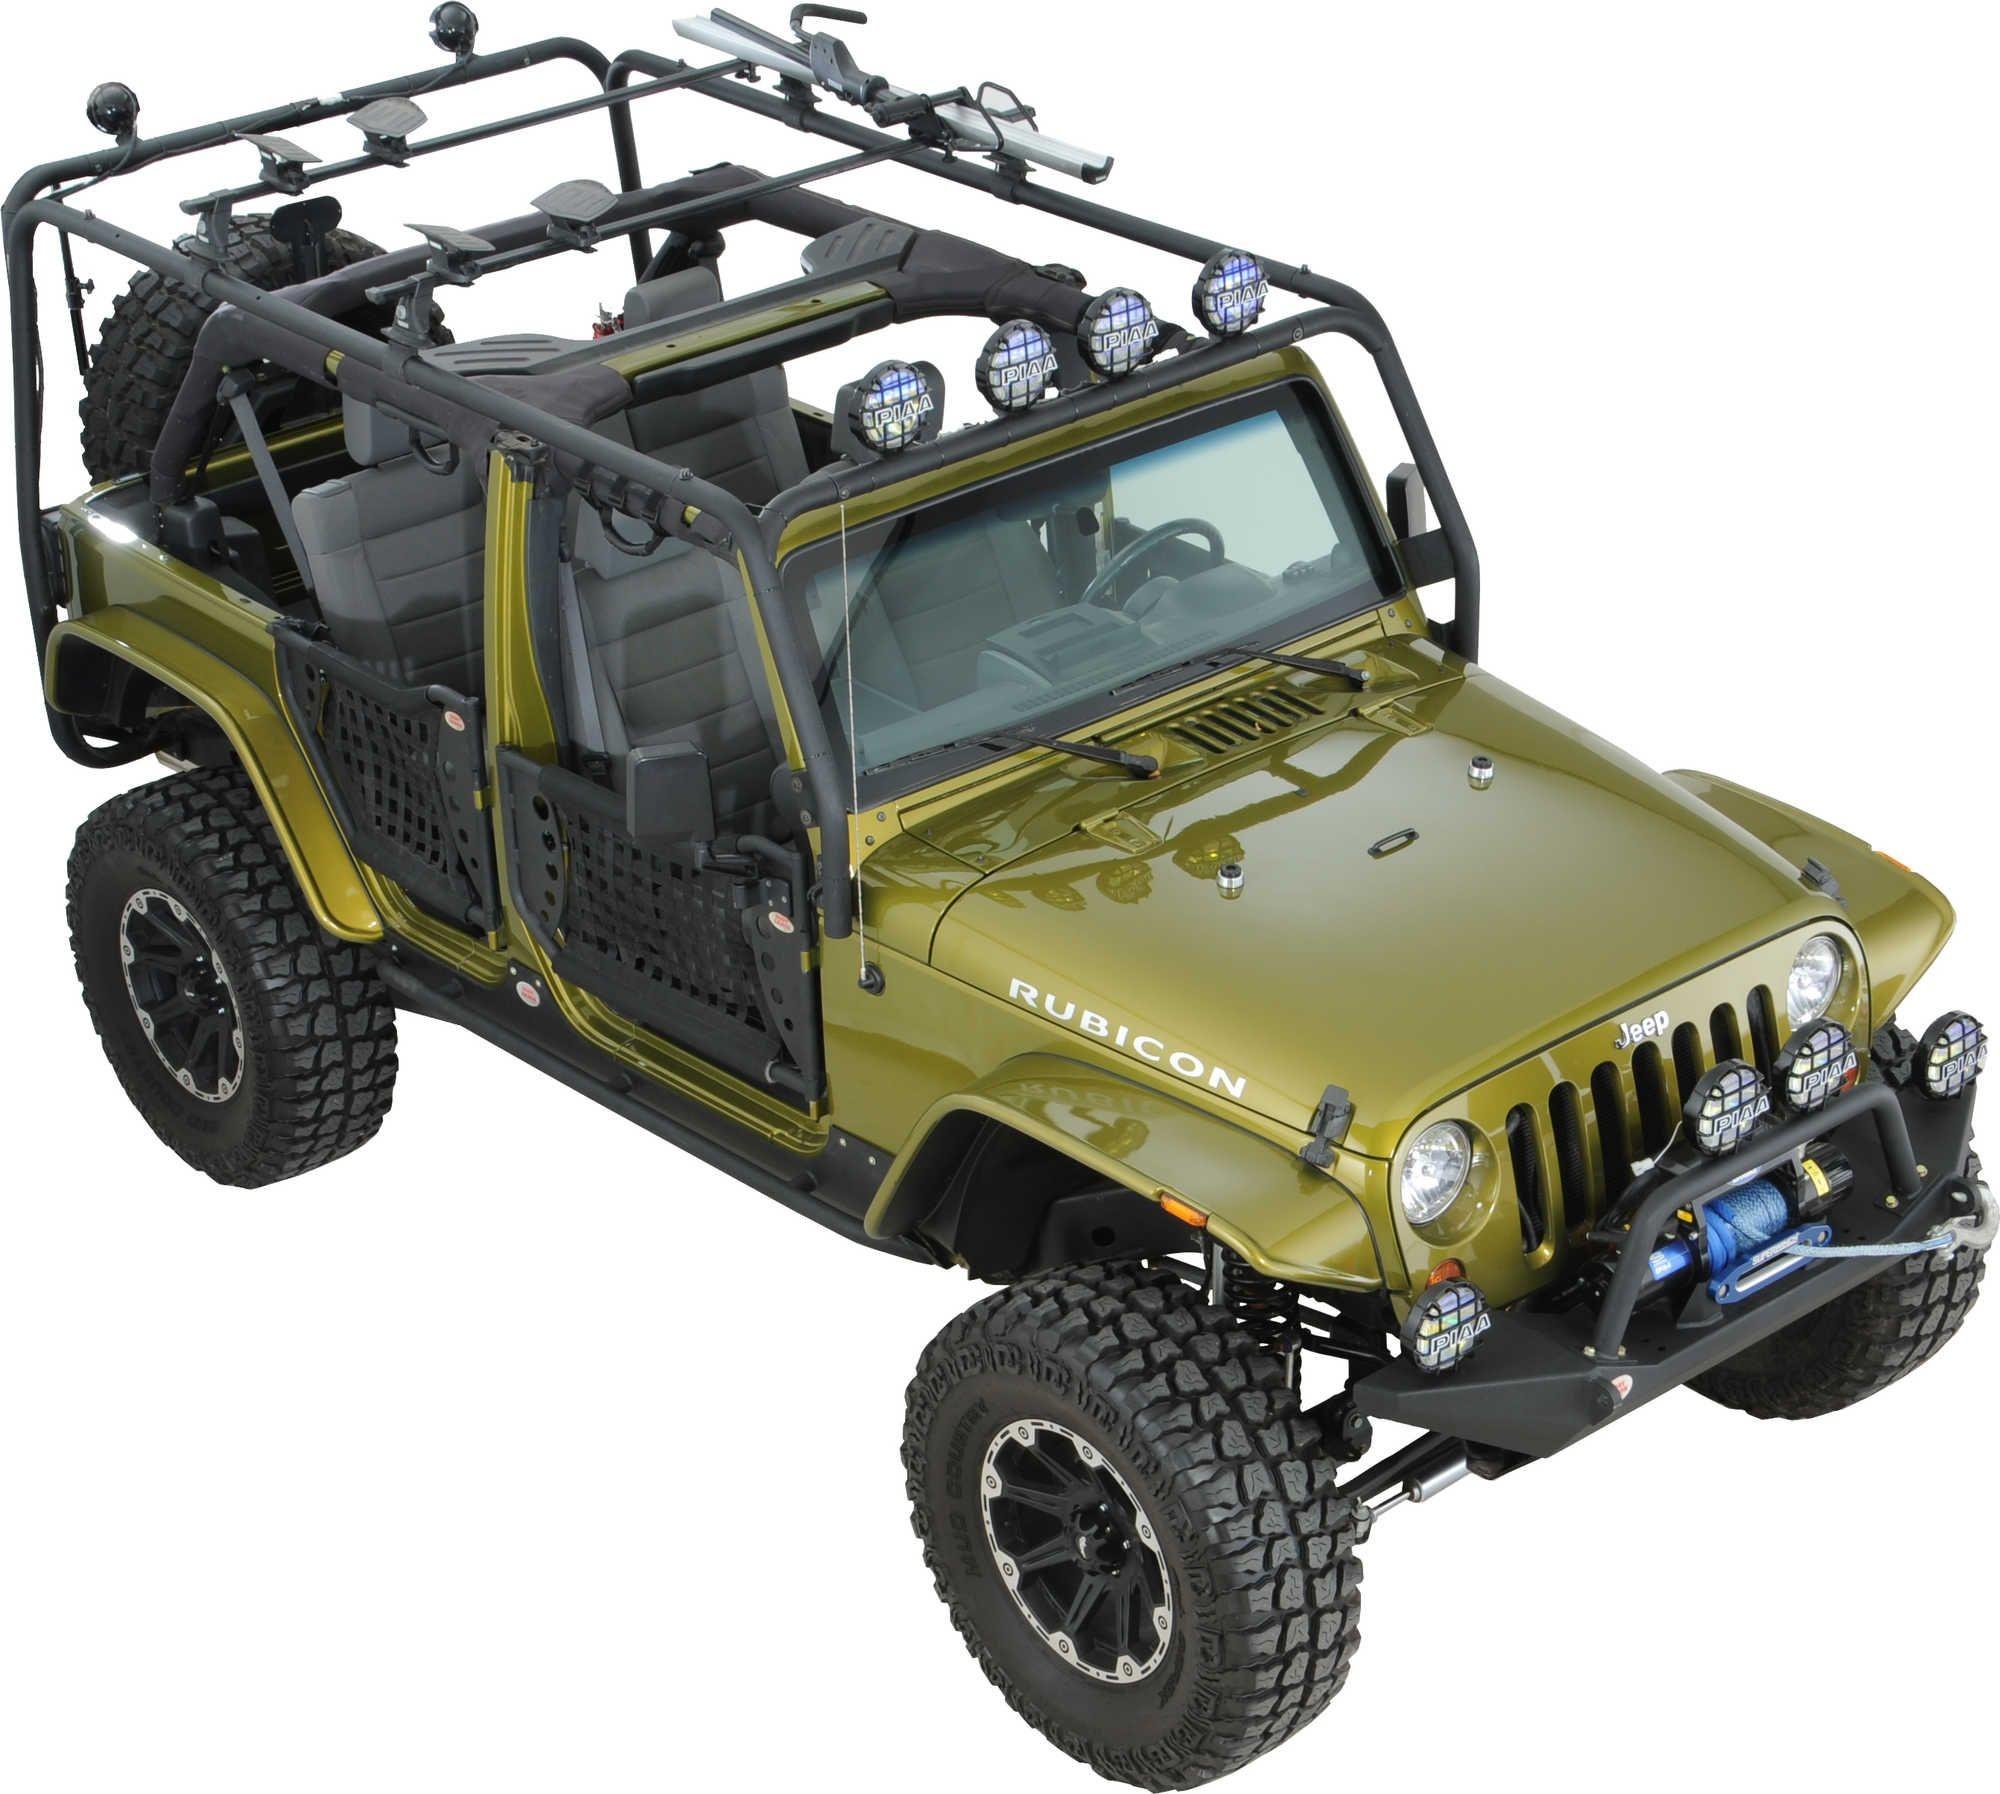 1997 Jeep Wrangler Parts Diagram Body Armor 4×4 Roof Rack Base Kit for 07 16 Jeep Wrangler Jk 2 Door Of 1997 Jeep Wrangler Parts Diagram